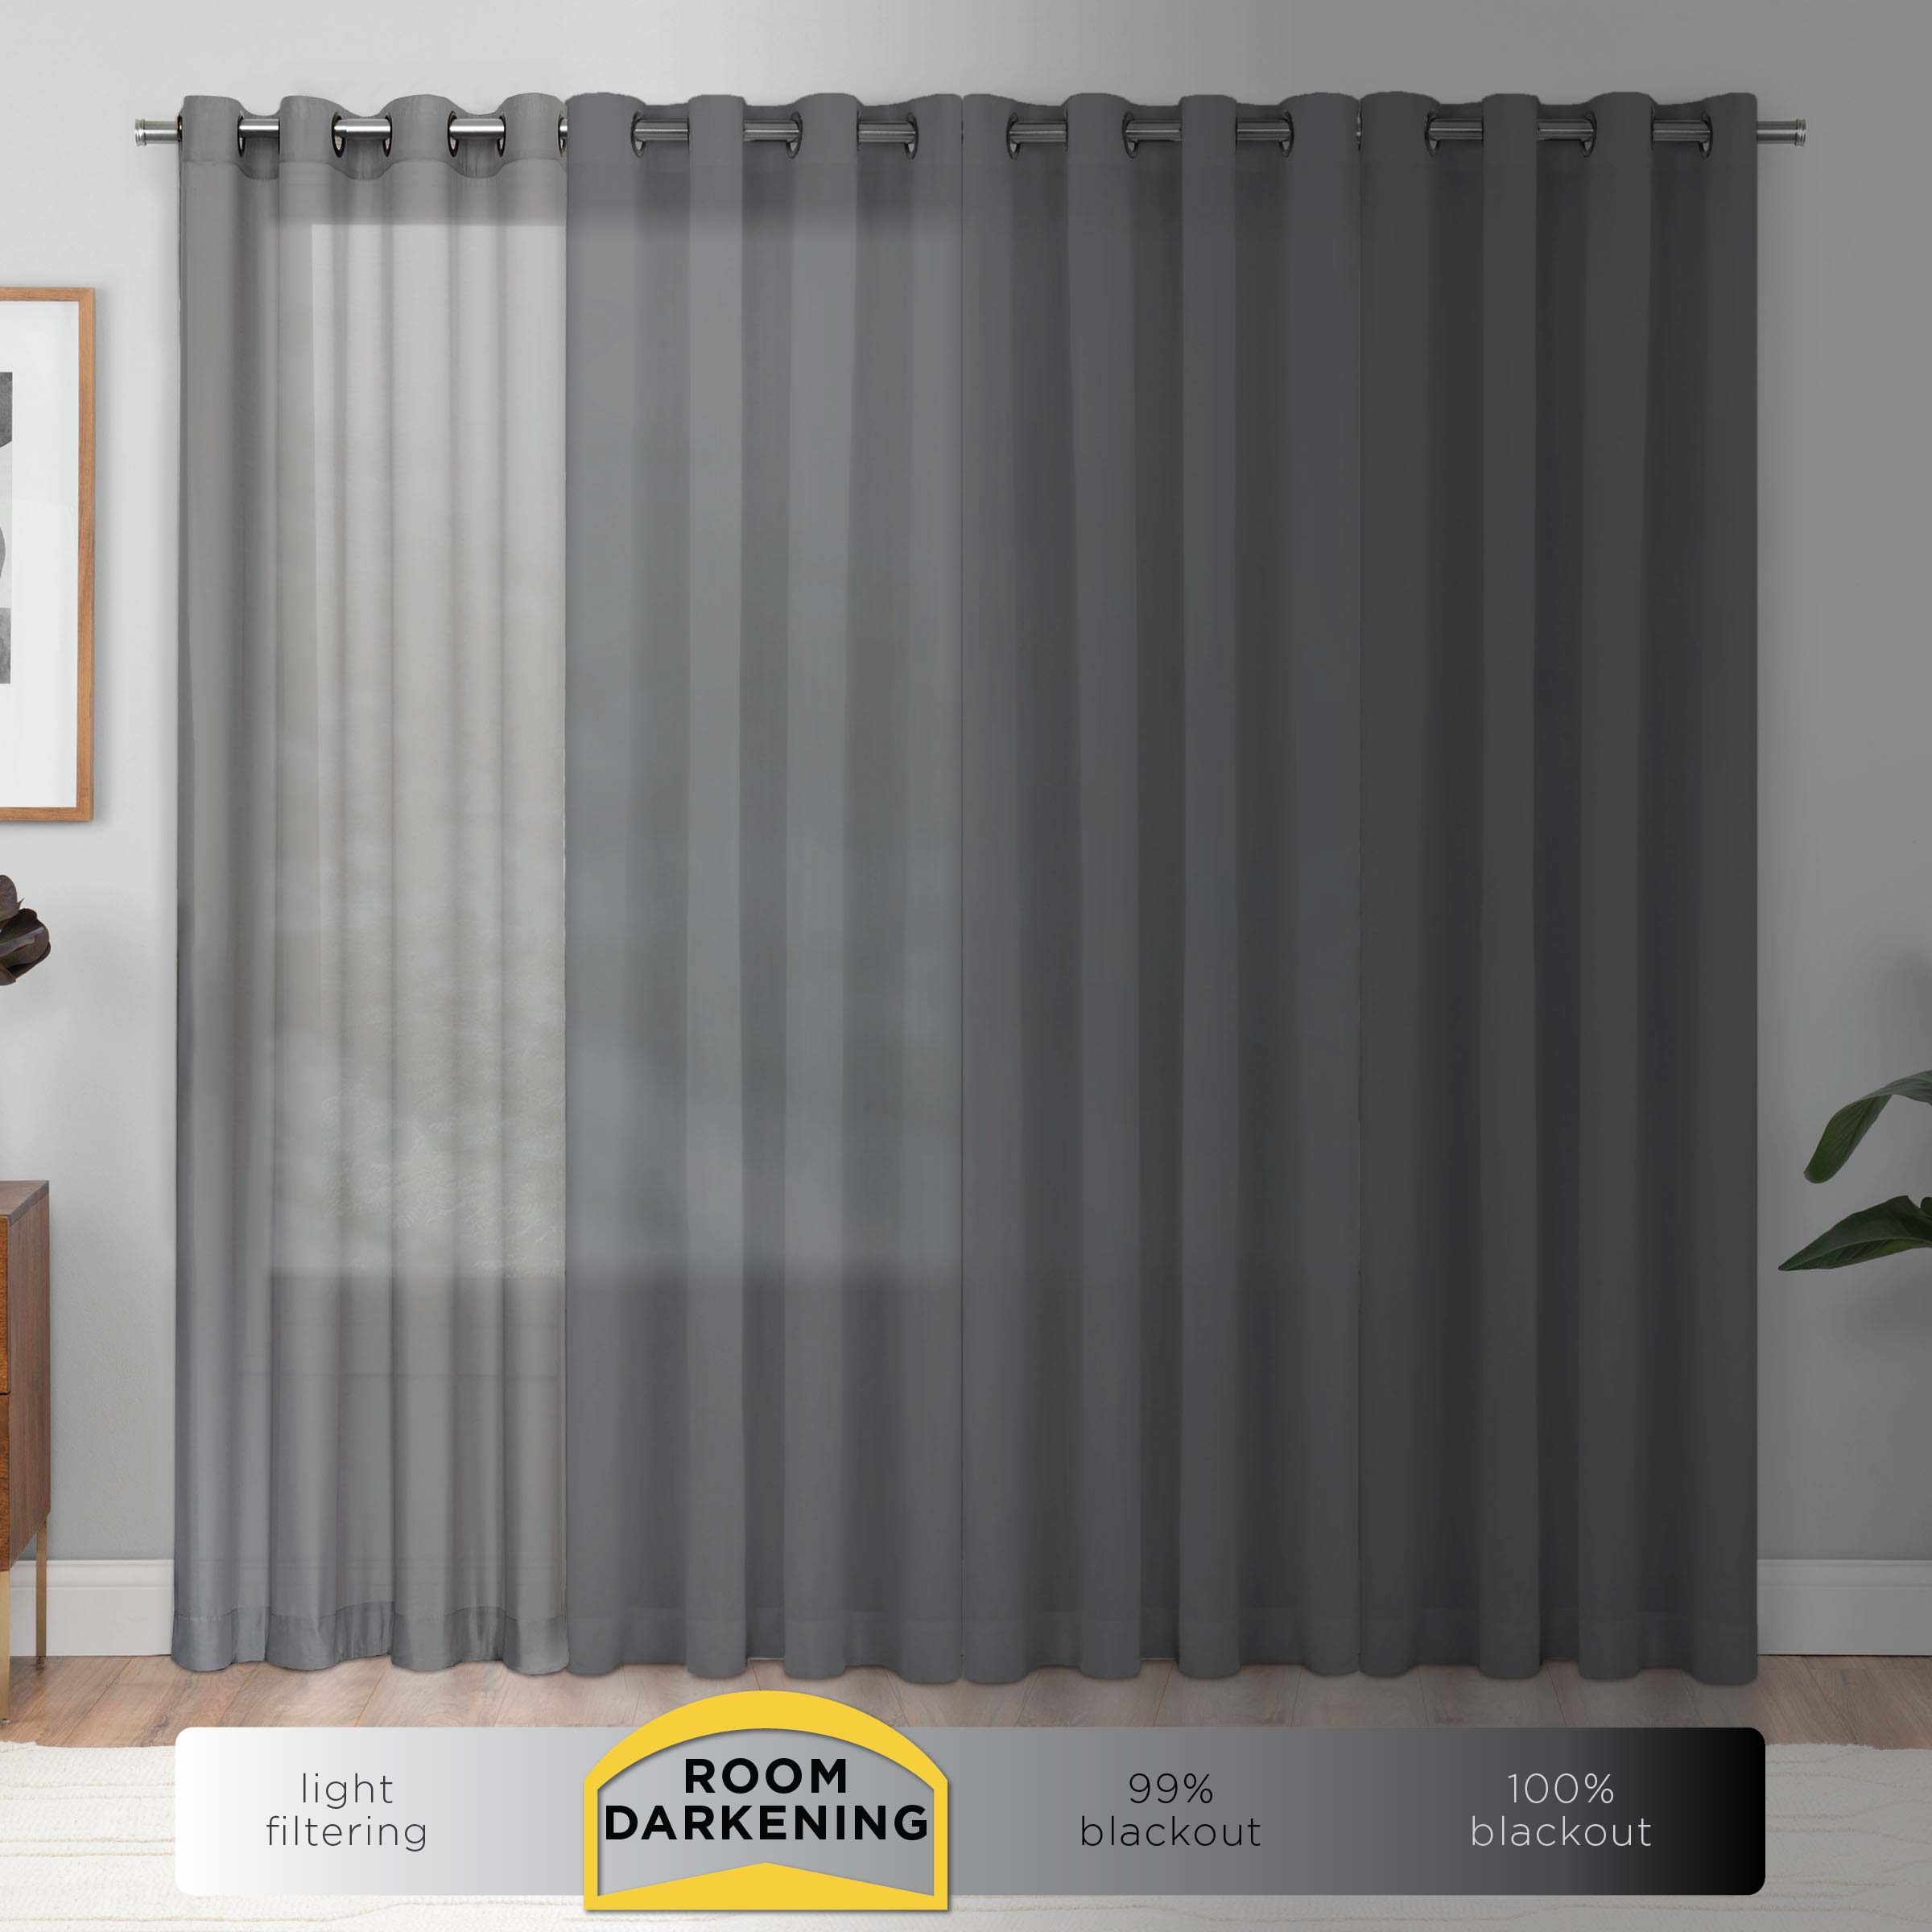 Mainstays Room Darkening Solid Woven Curtain Panel Pair Walmart Com Walmart Com